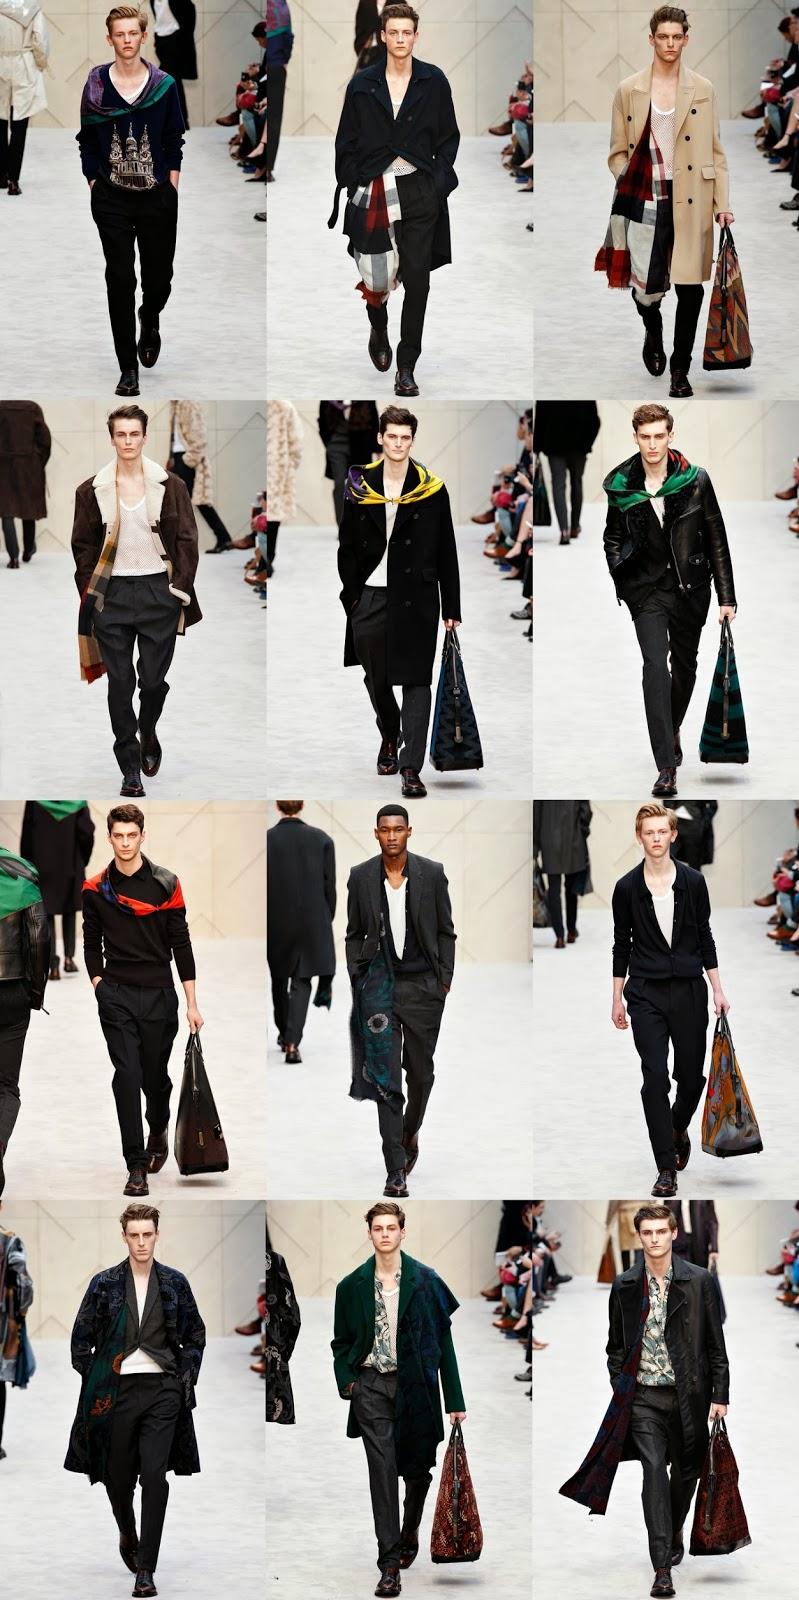 Burberry Prorsum Menswear, Burberry Prorsum Fall Winter, Burberry Prorsum Harry Styles